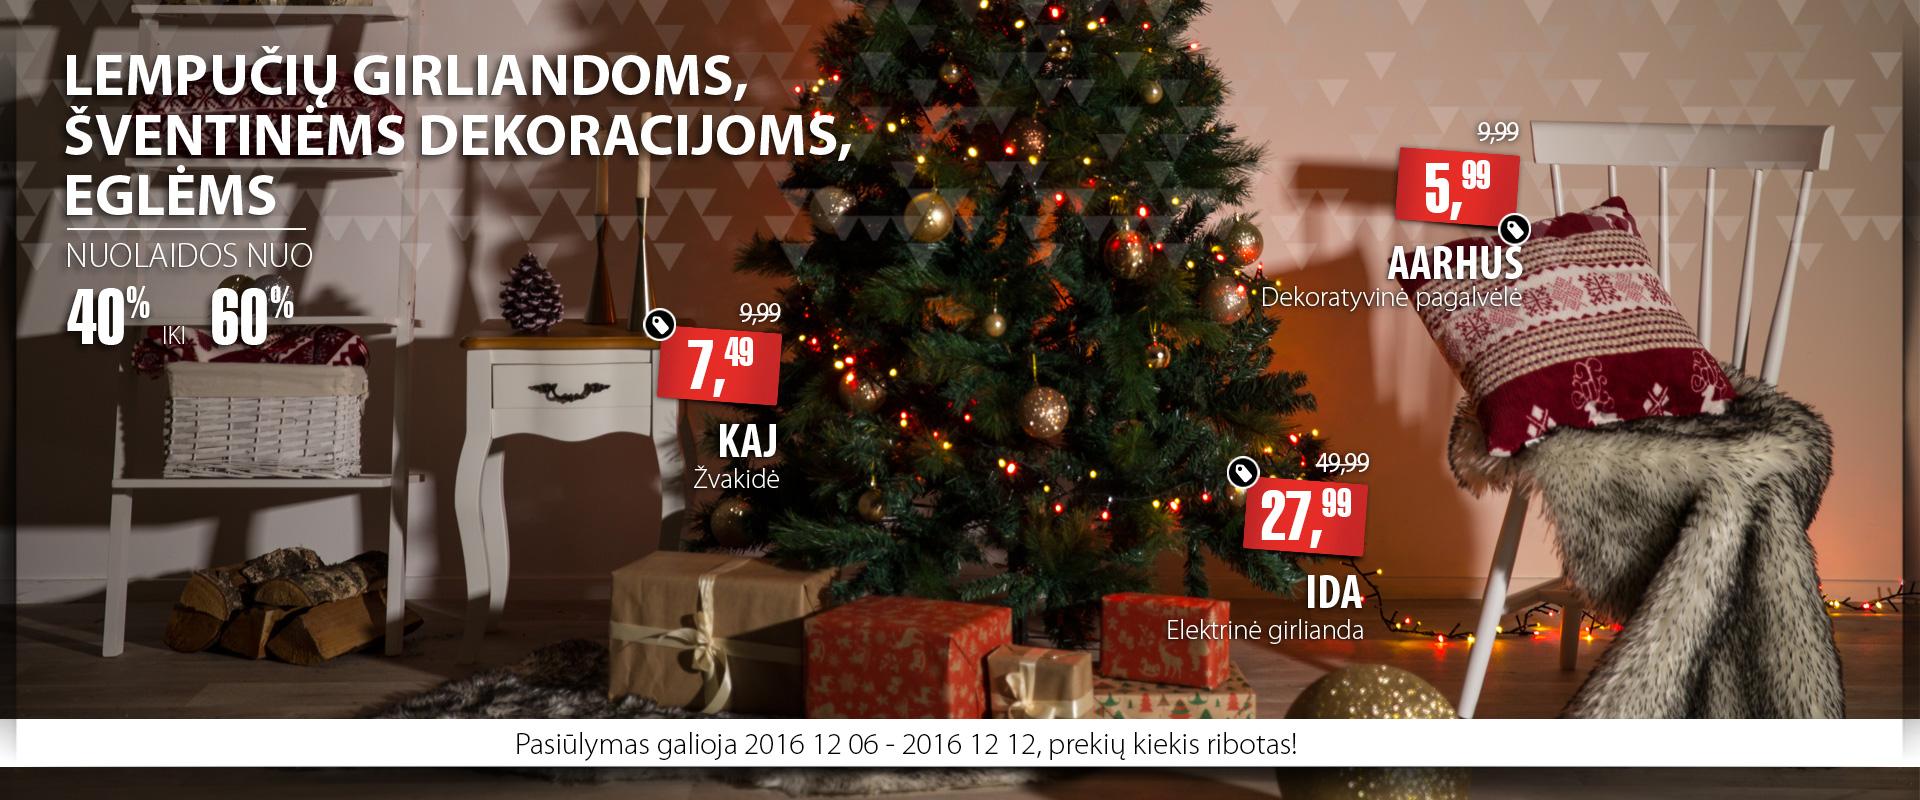 CHRISTMAS_DECEMBER_II_06_12_13_12_2016_LT